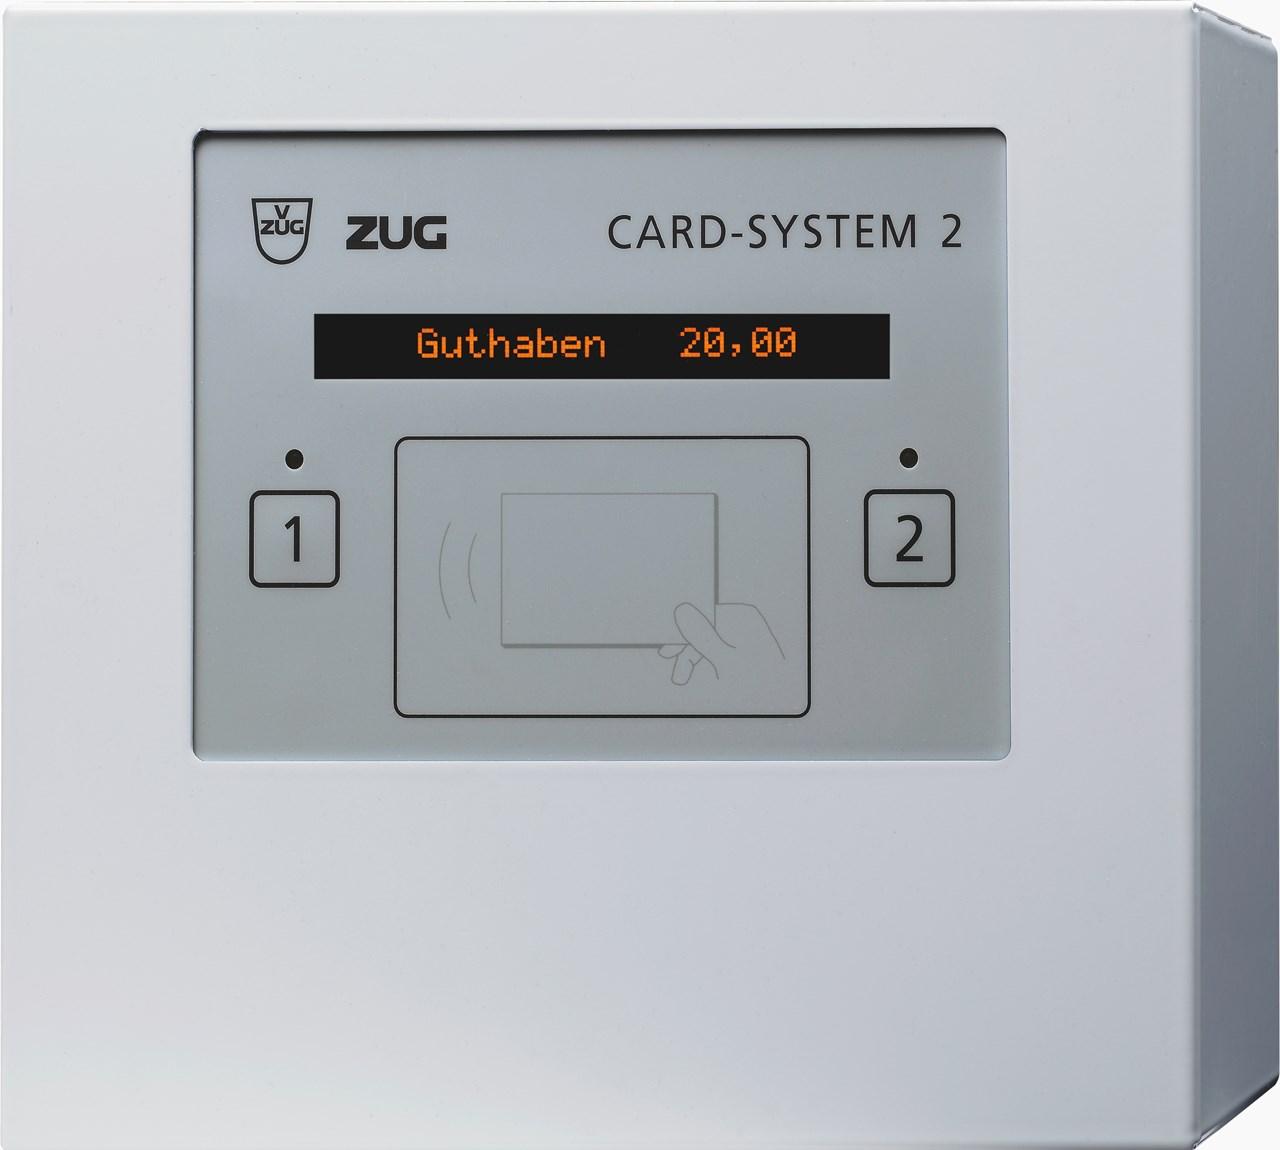 v zug card system 2 f r betrieb von 2 ger ten silver tech. Black Bedroom Furniture Sets. Home Design Ideas